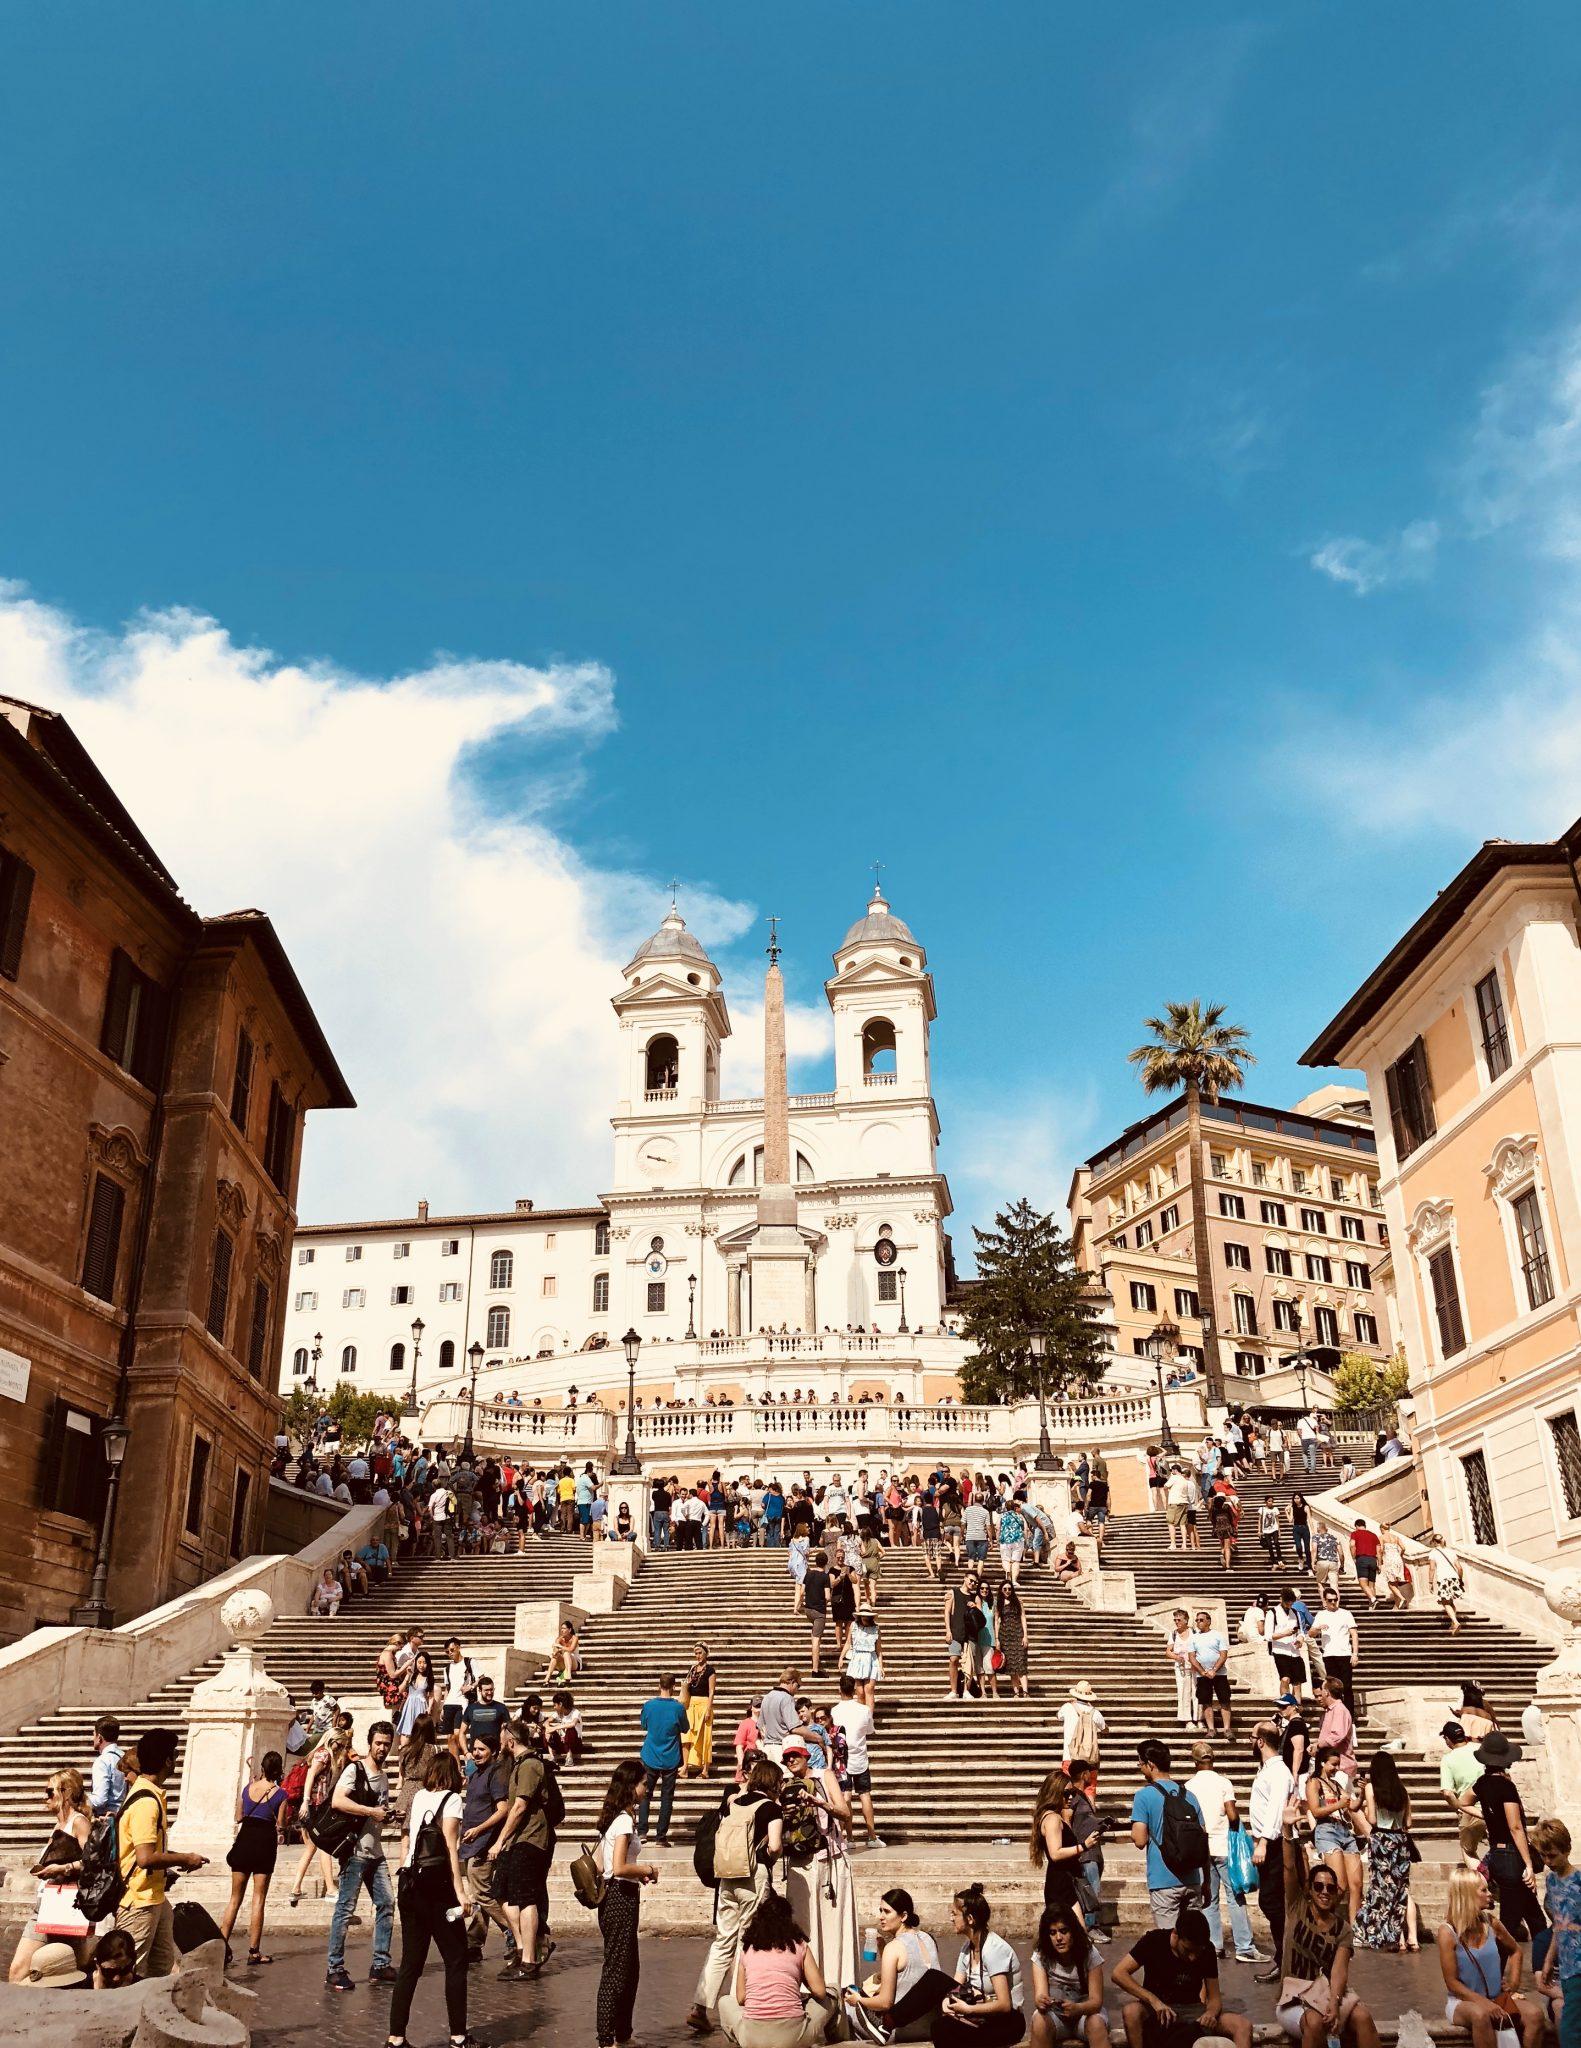 Pressereise: #KENZOPOPPYPARADE in Rom